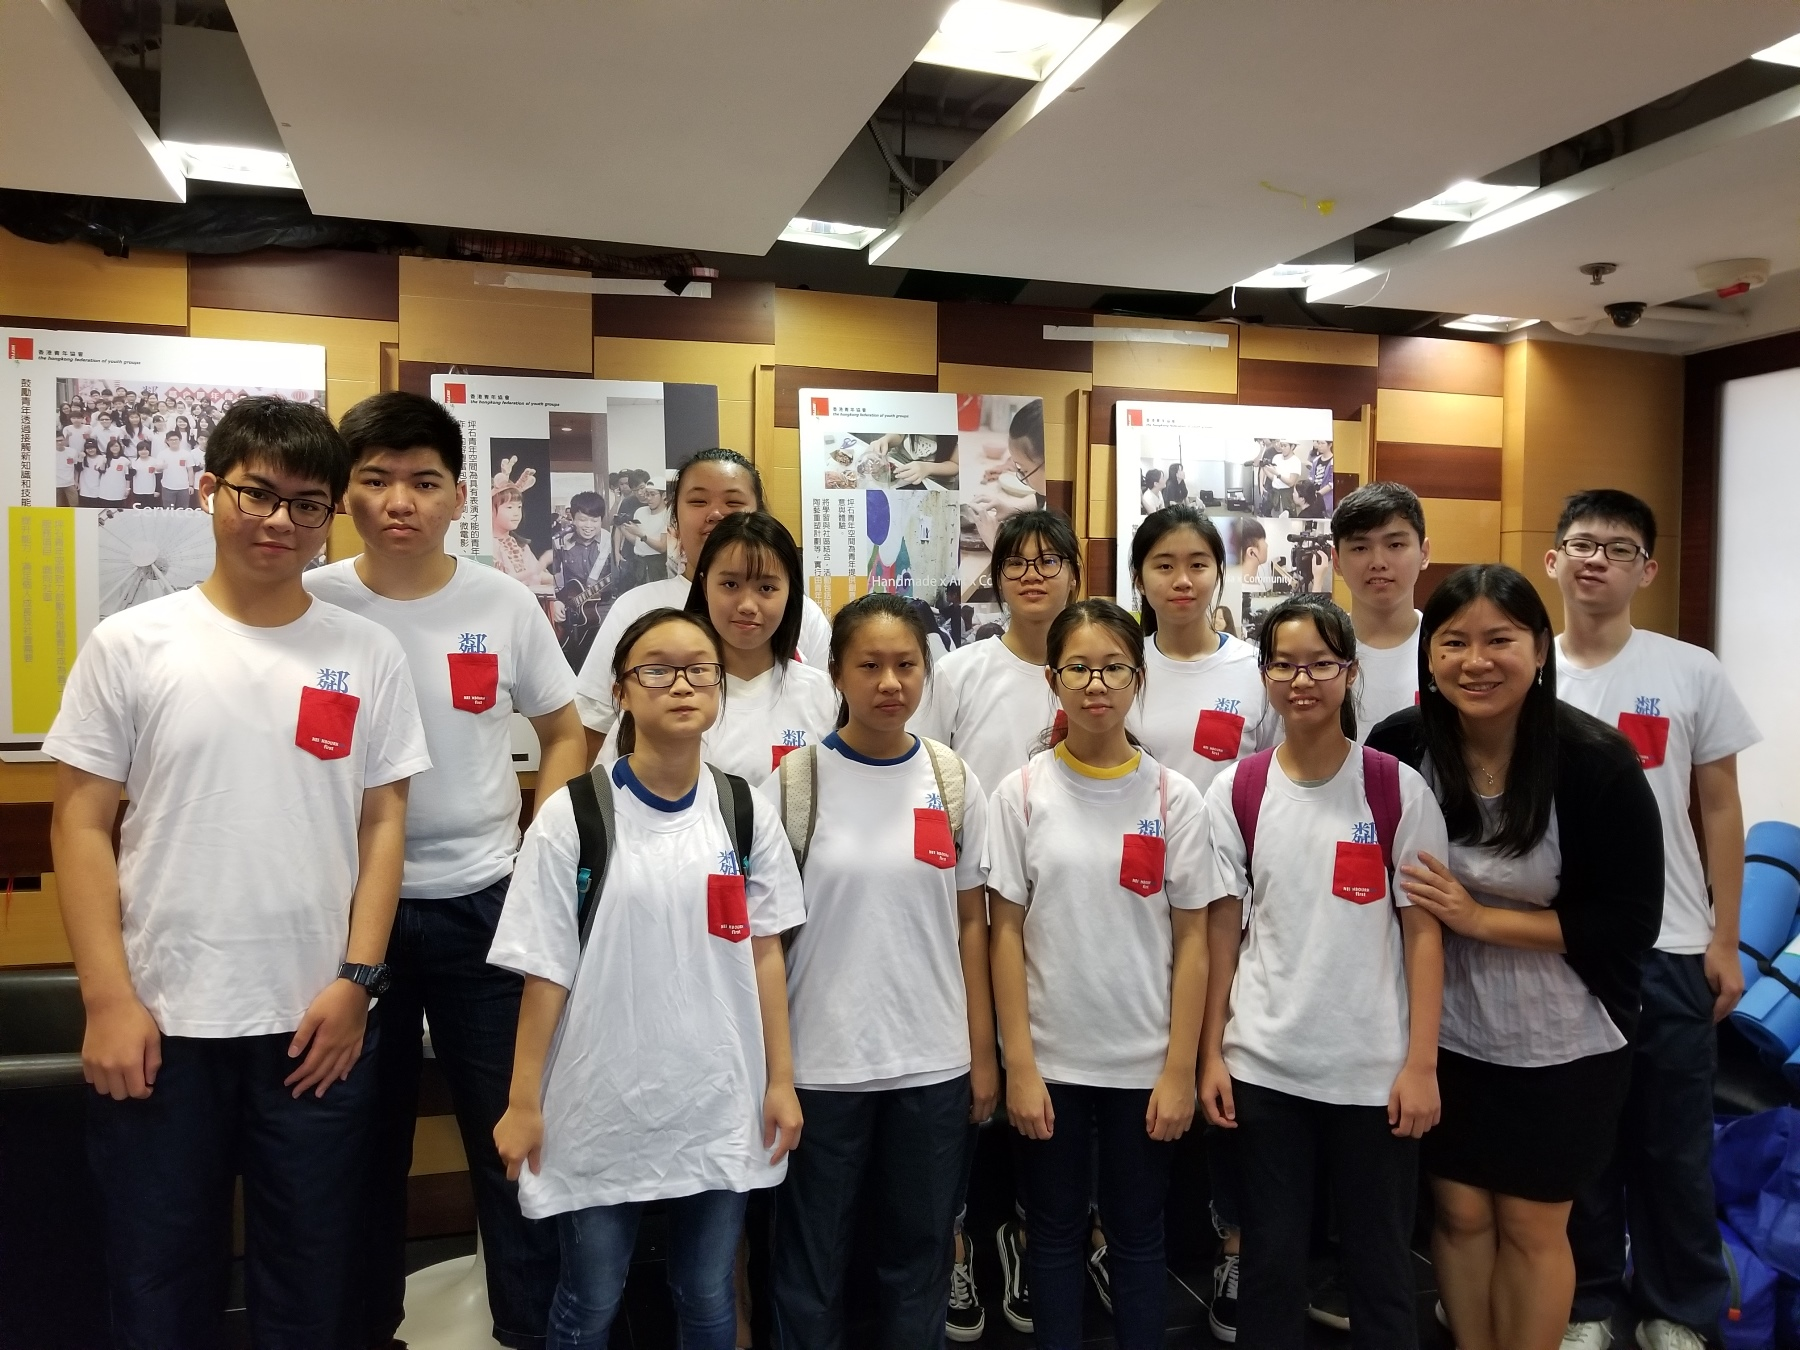 https://www.npc.edu.hk/sites/default/files/20191102_100704.jpg